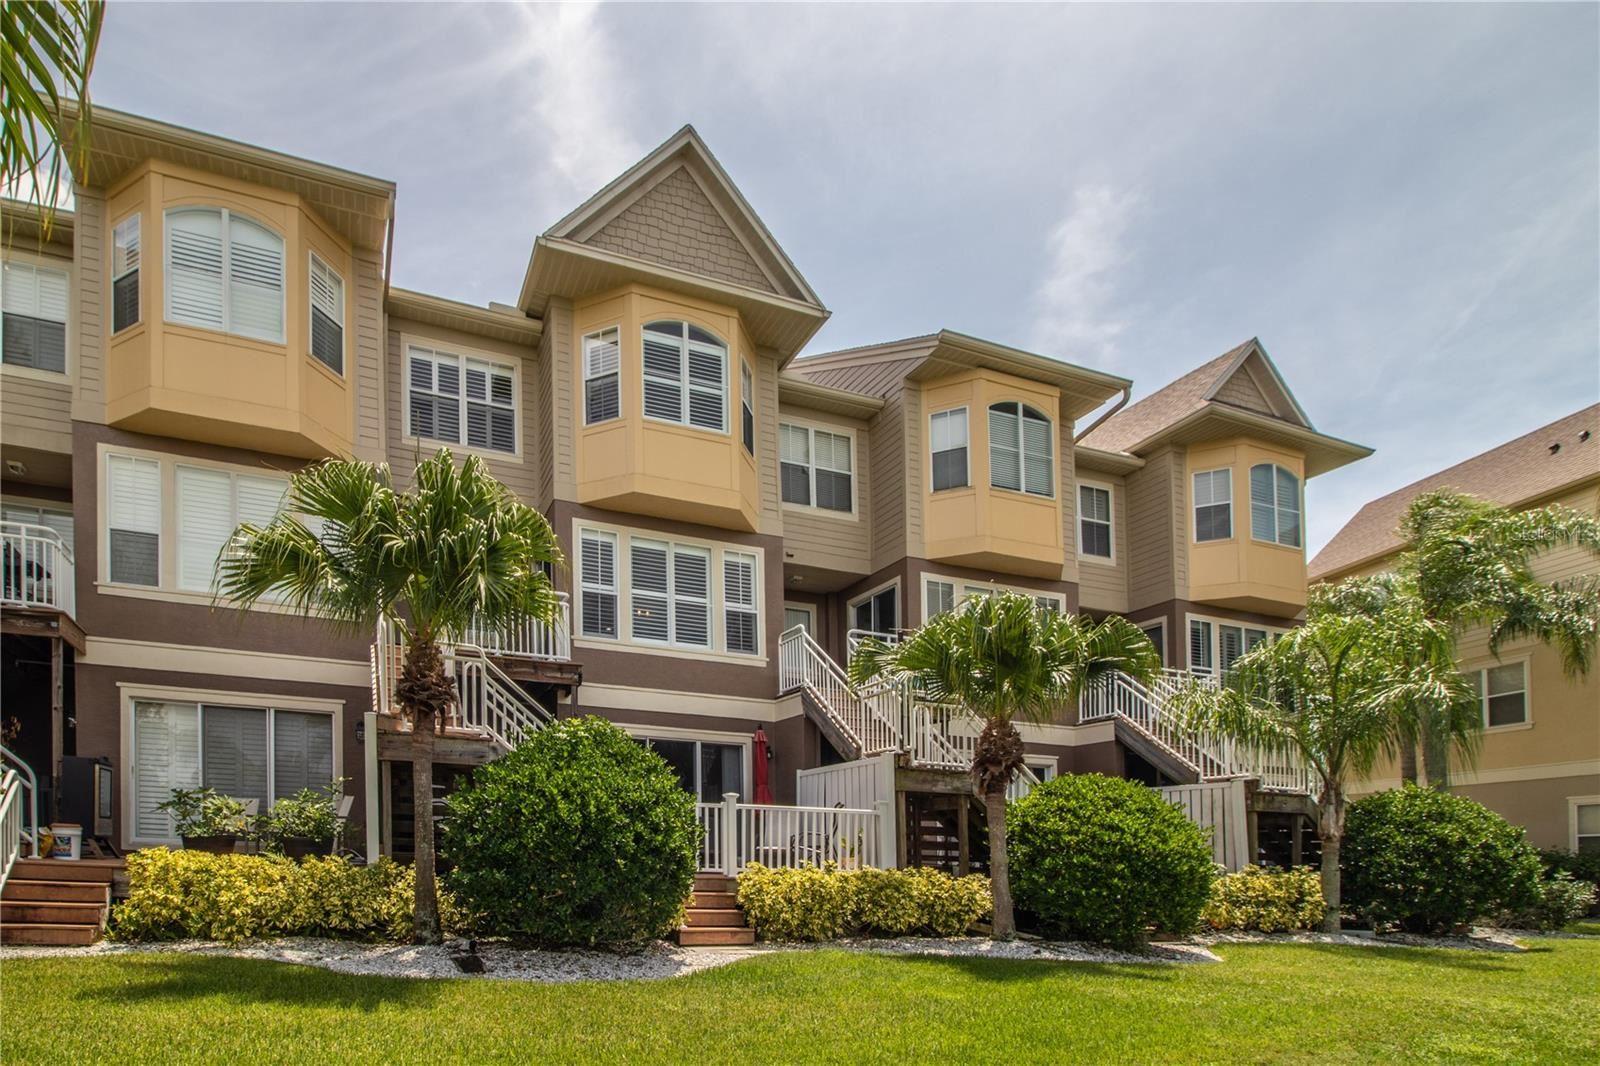 4318 SPINNAKER COVE LANE, Tampa, FL 33615 - #: T3326965